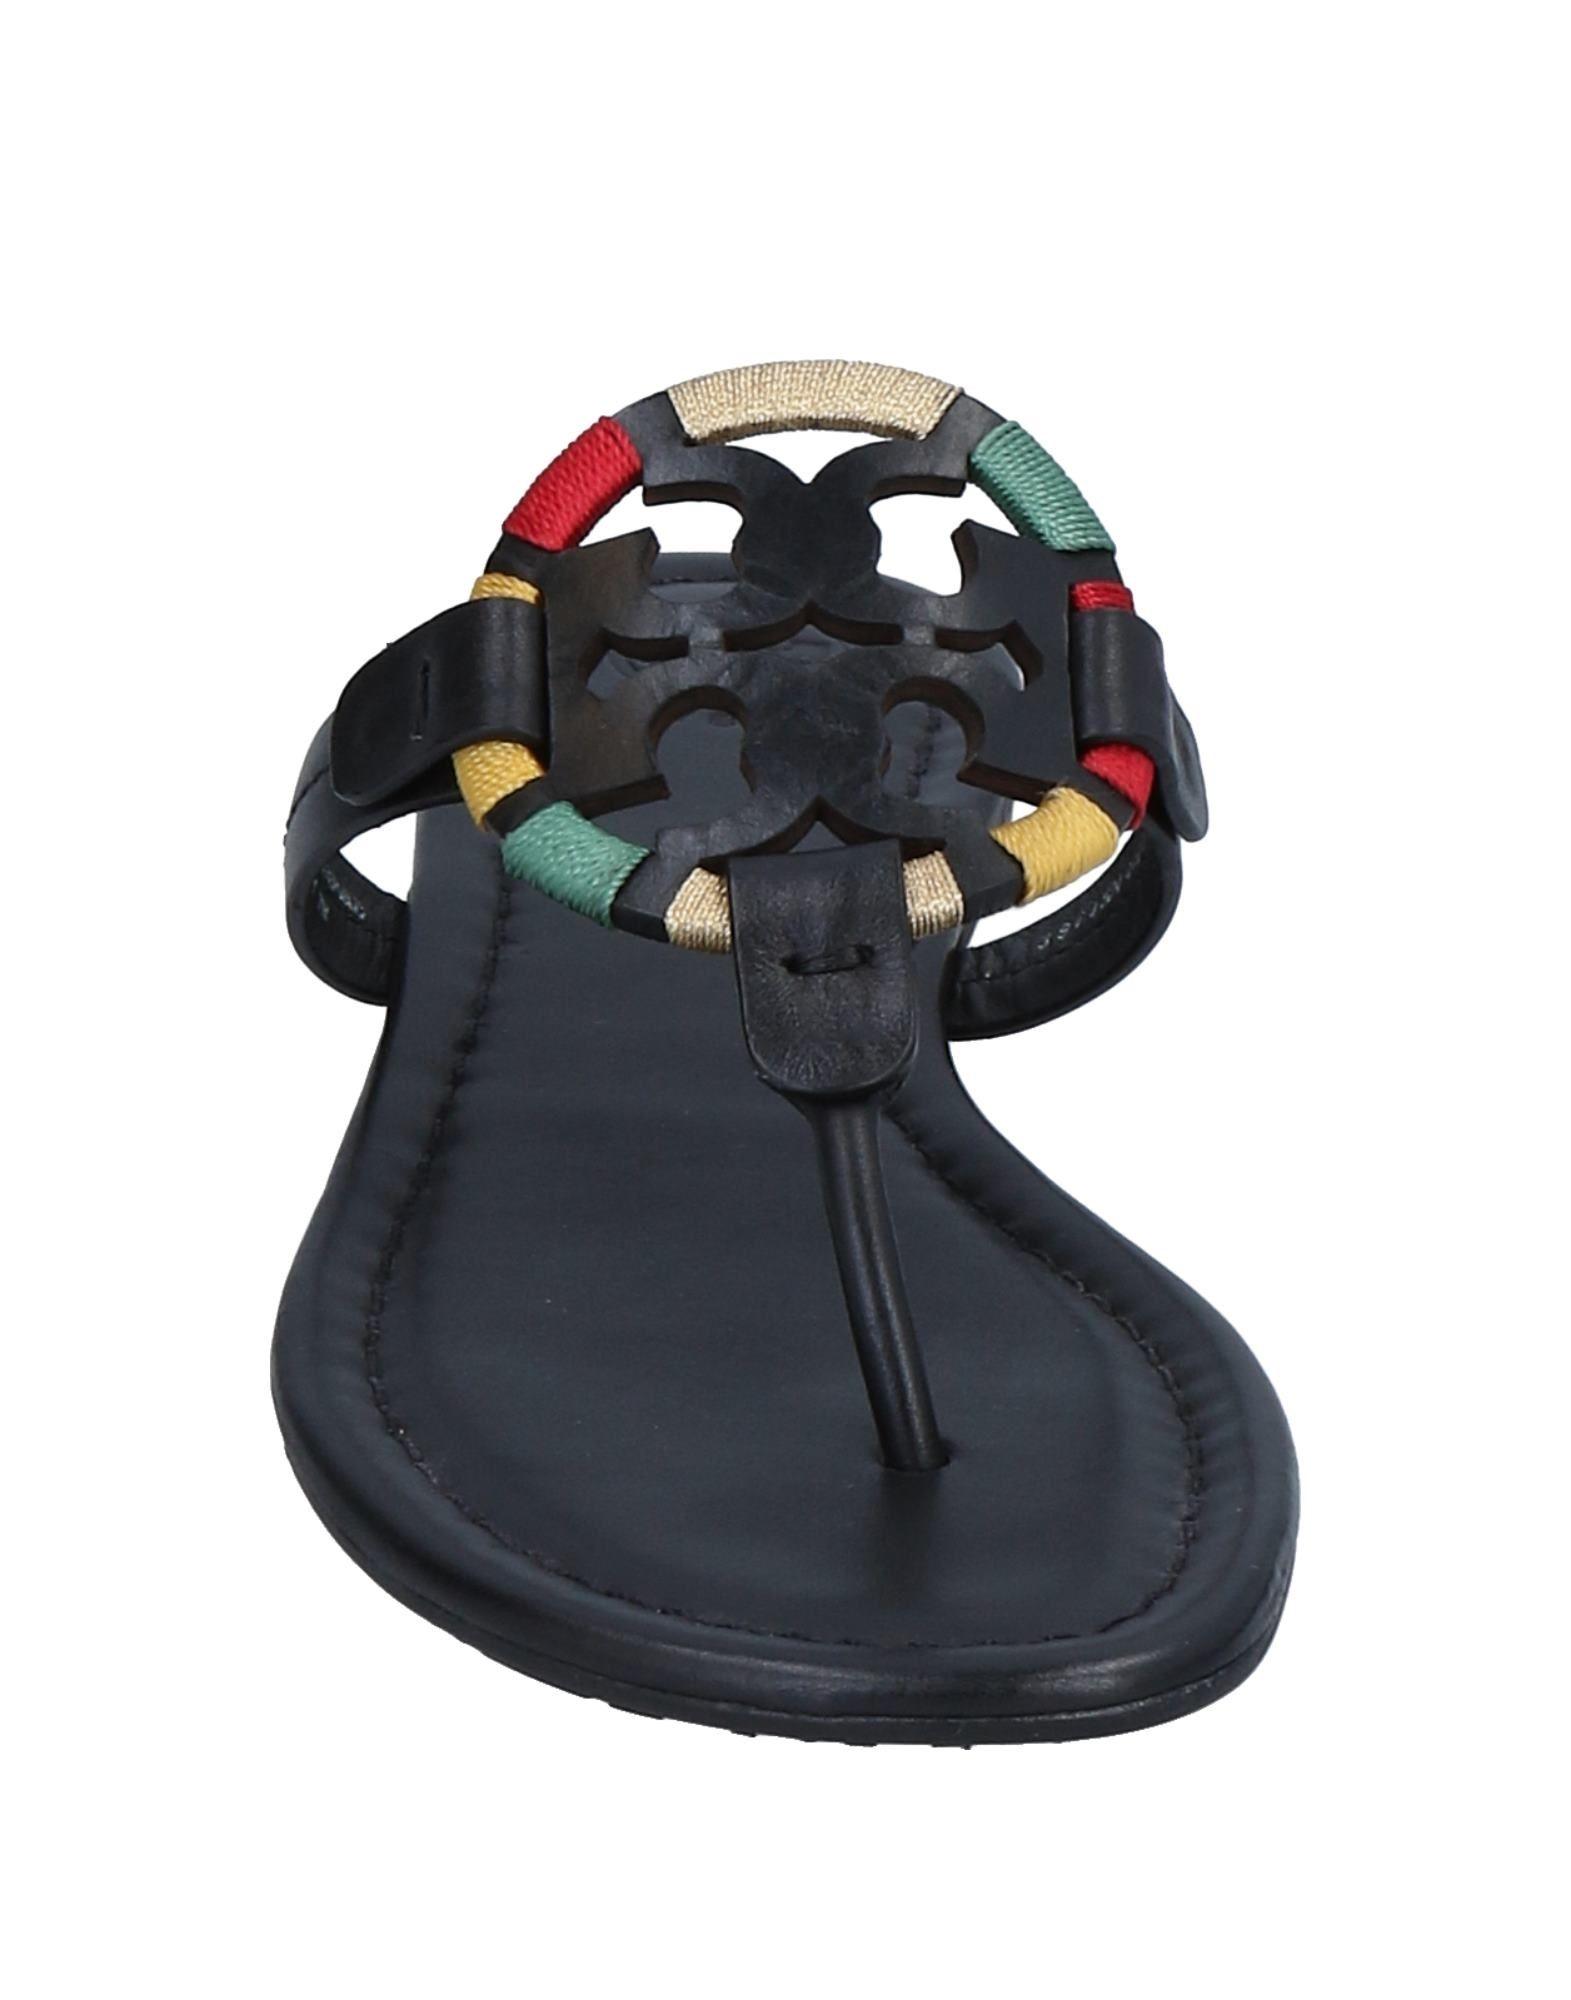 Stilvolle billige Schuhe 11534846GM Tory Burch Dianetten Damen 11534846GM Schuhe 456119